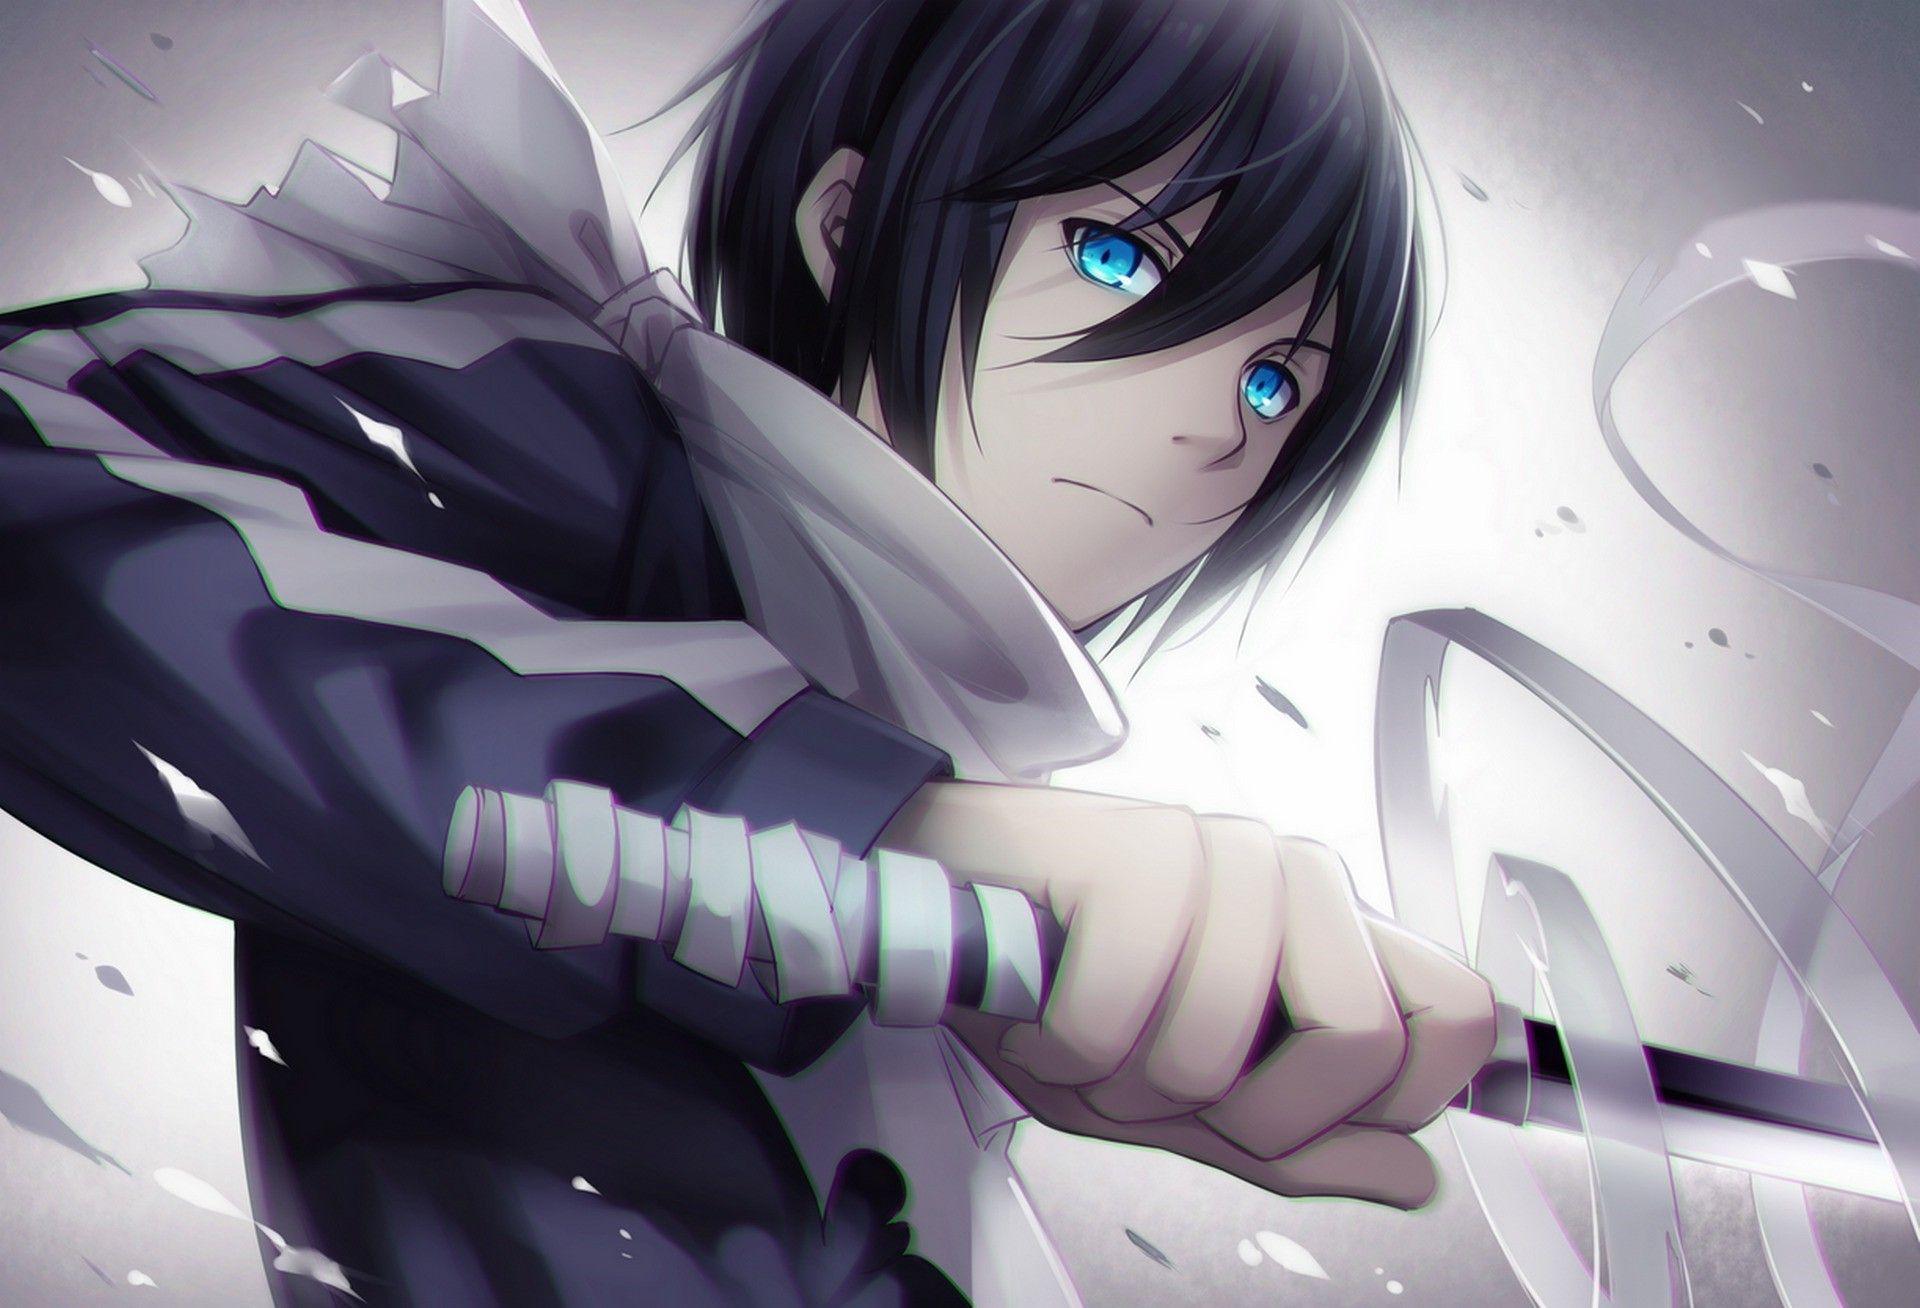 Cute anime boy wallpaper anime handsome cute boy desktop background